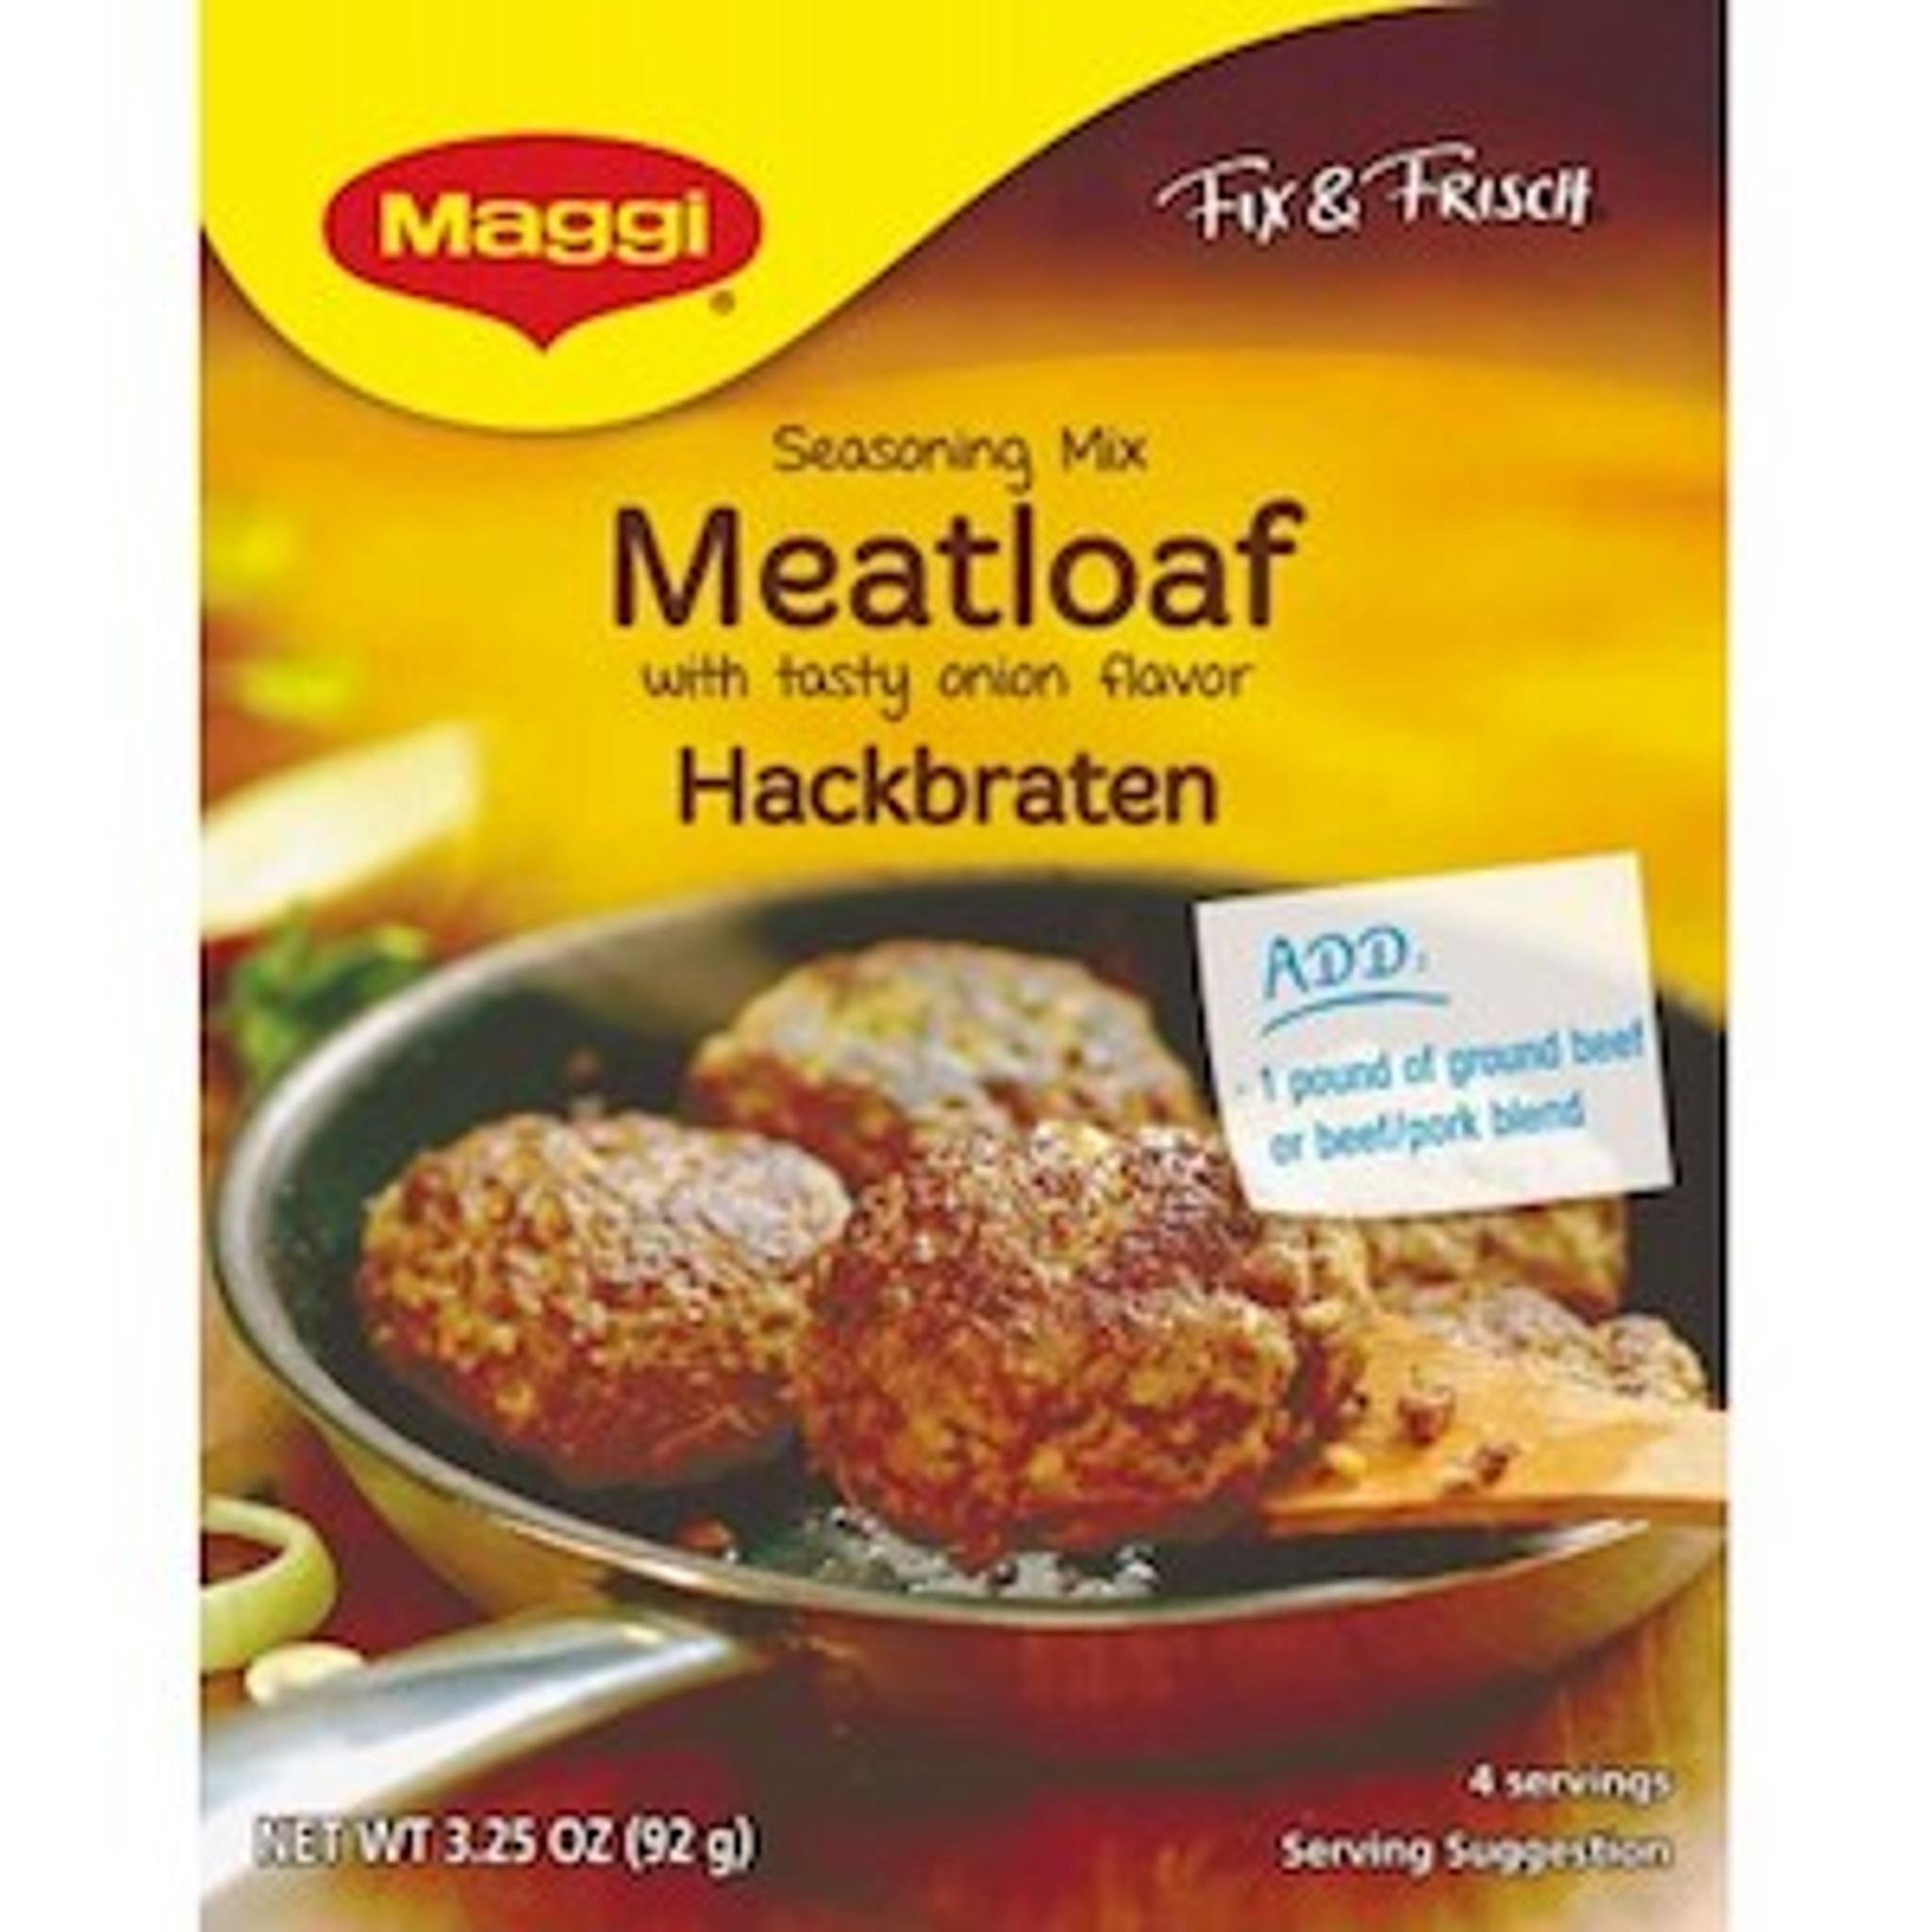 Maggi German Hackbraten Meat Loaf Mix 325 Oz The Taste Of Germany